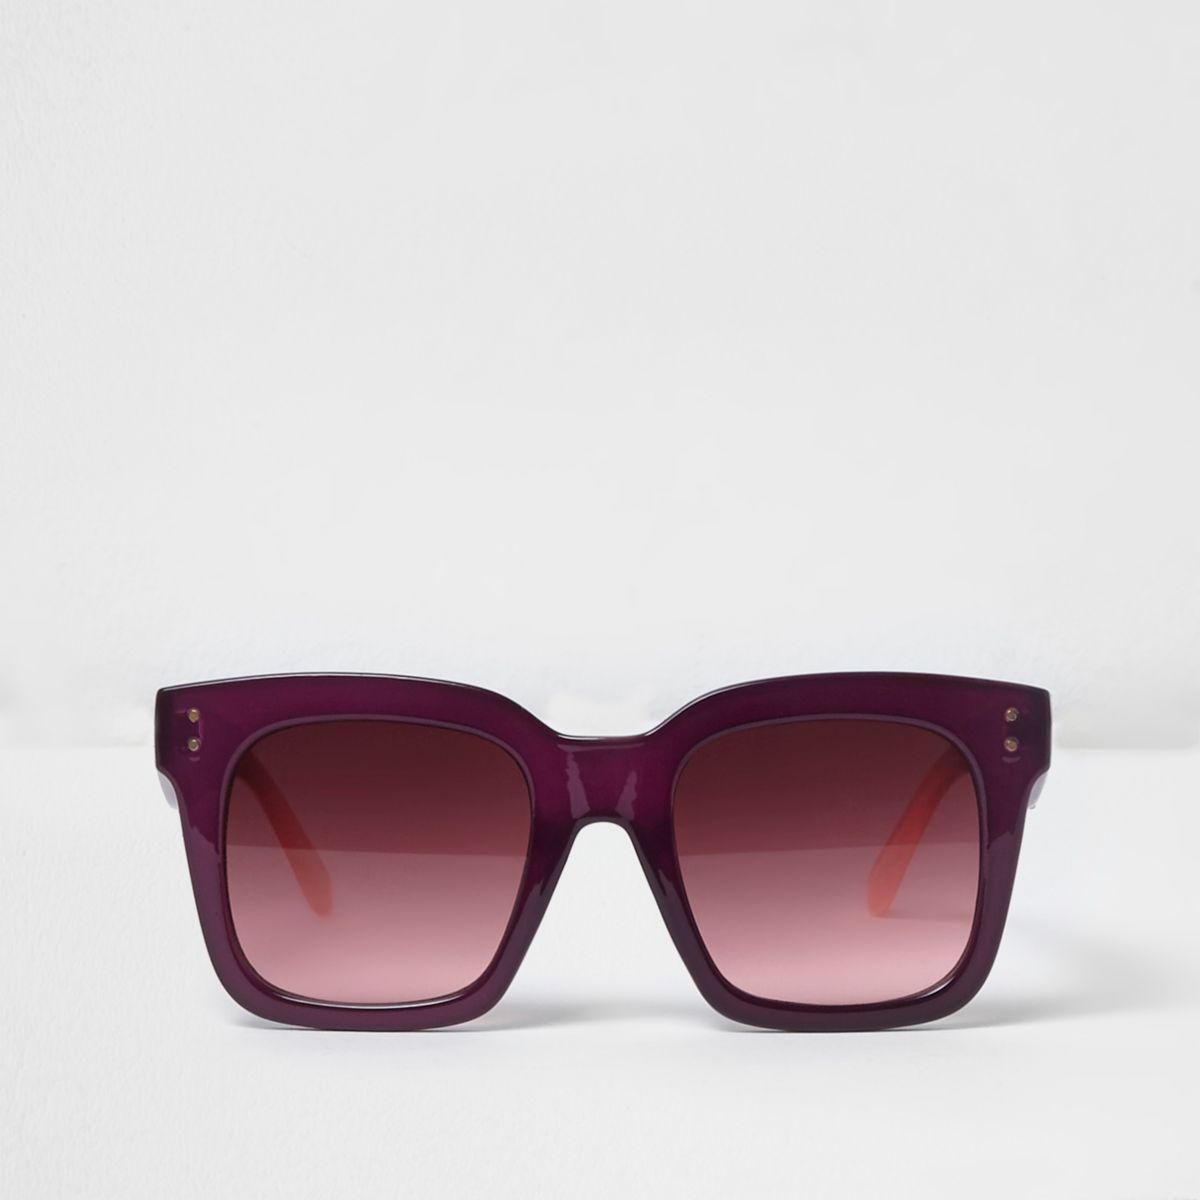 Purple square frame oversized sunglasses